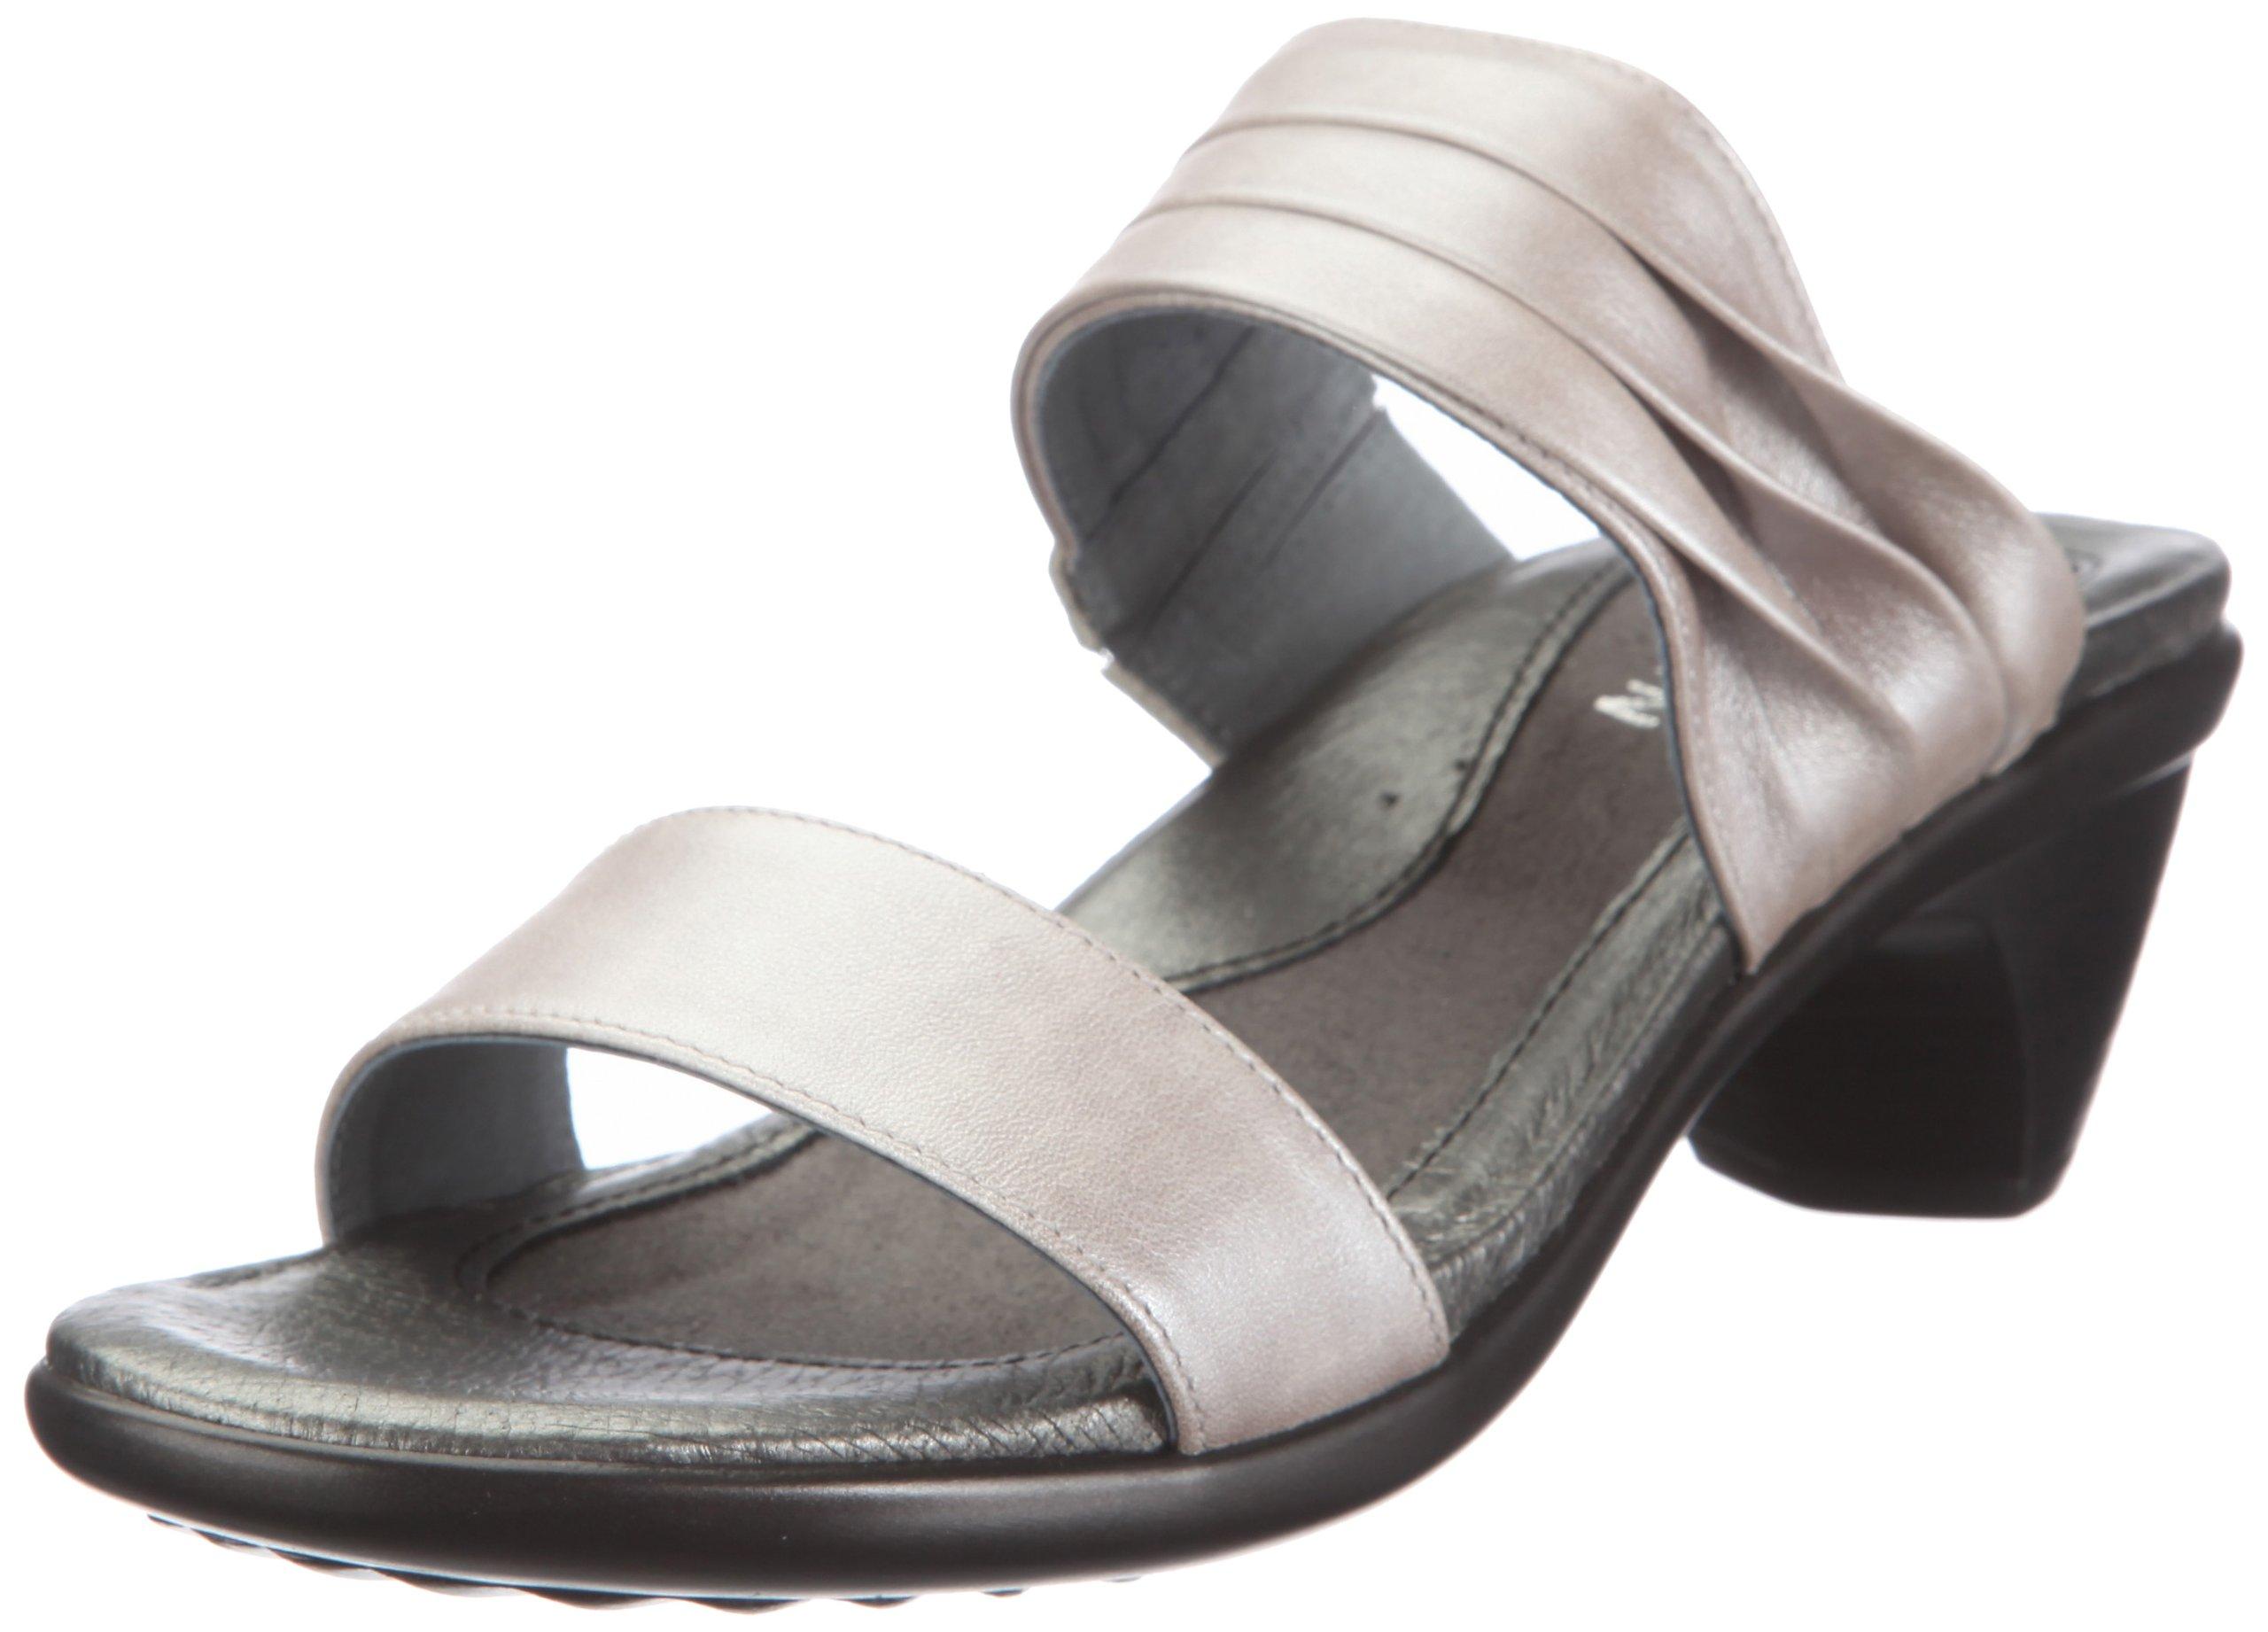 Naot Women's Isis Wedge Sandal, Quartz Leather, 35 EU/4.5-5 M US